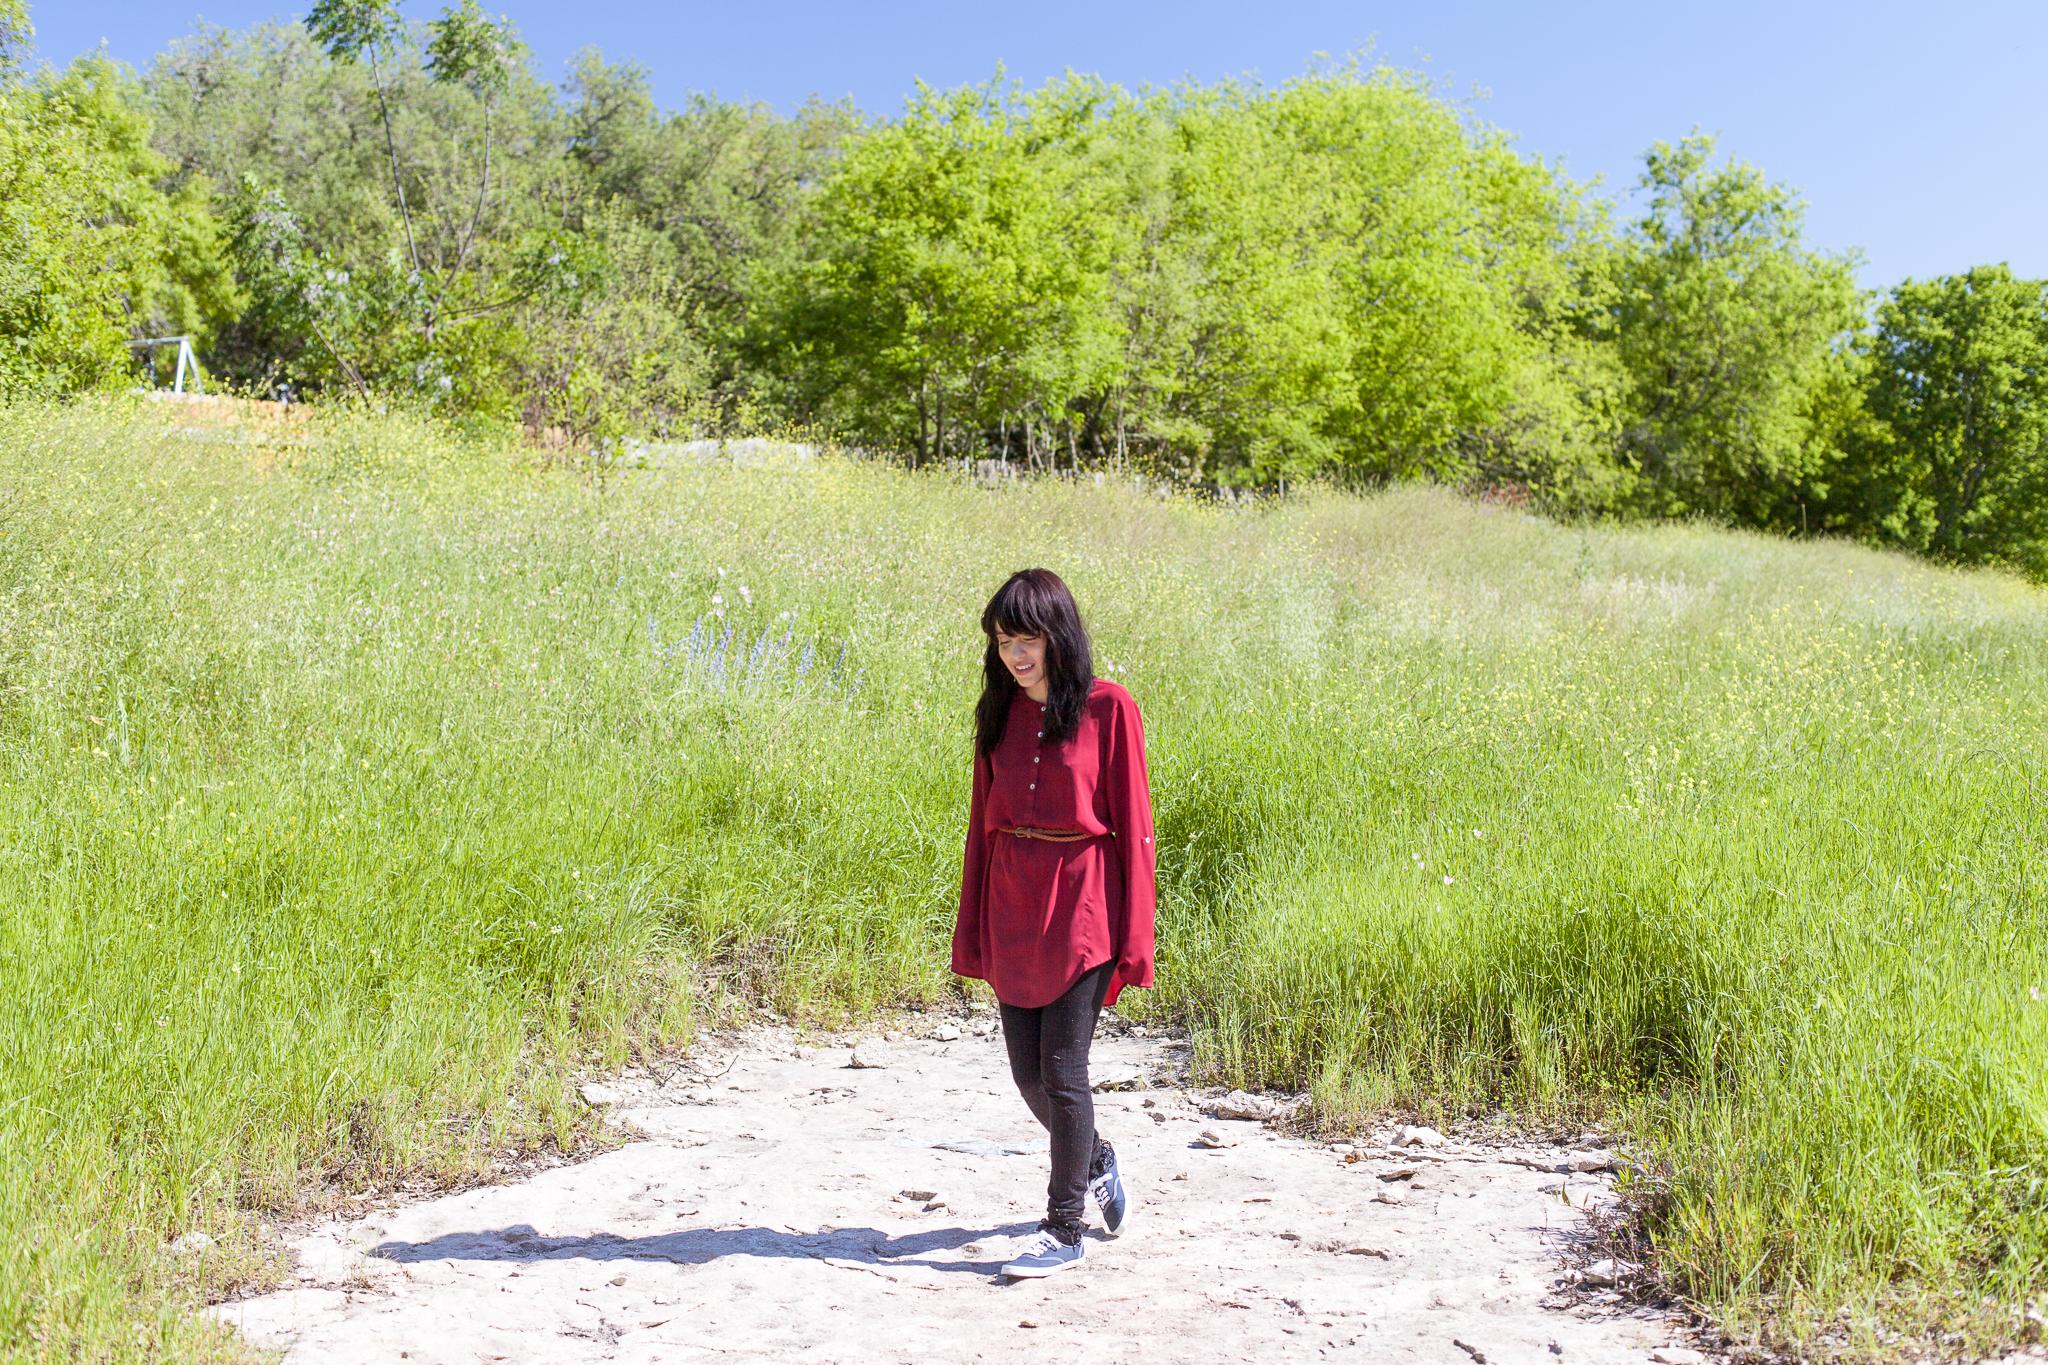 whomstudio-camuglia-nyc-photographer-headshot-fashion-brooklyn_0906-web.jpg